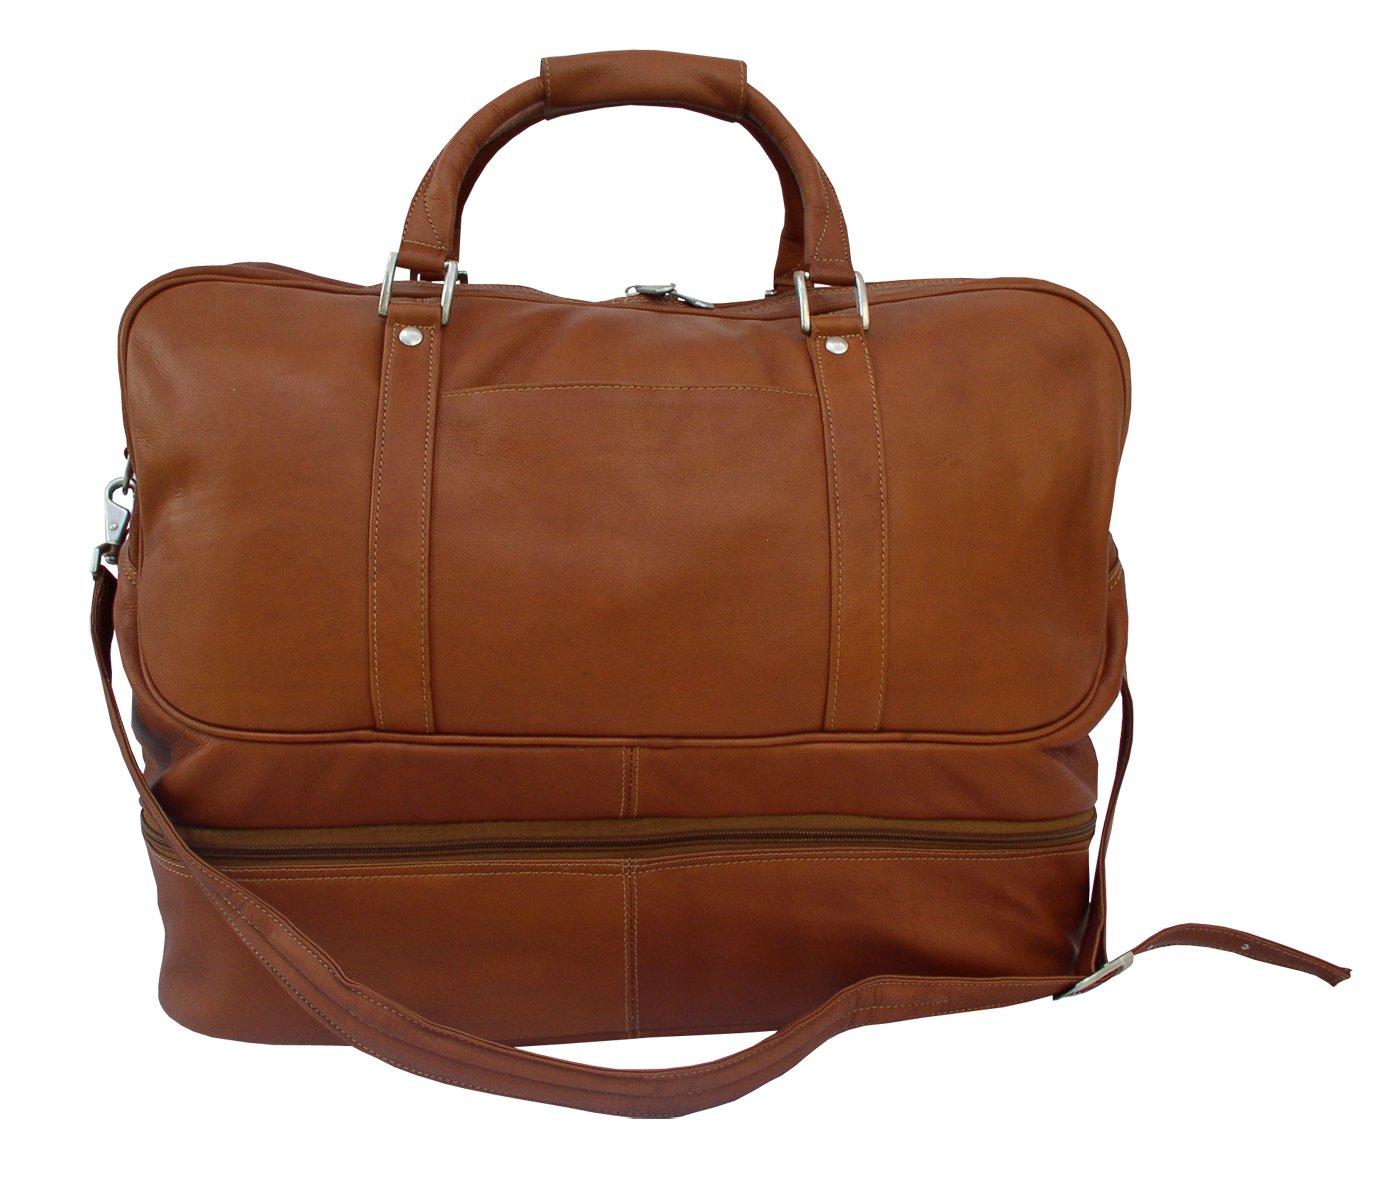 d0aac77f0c0d Piel Leather False-Bottom Sports Bag, Saddle, One Size